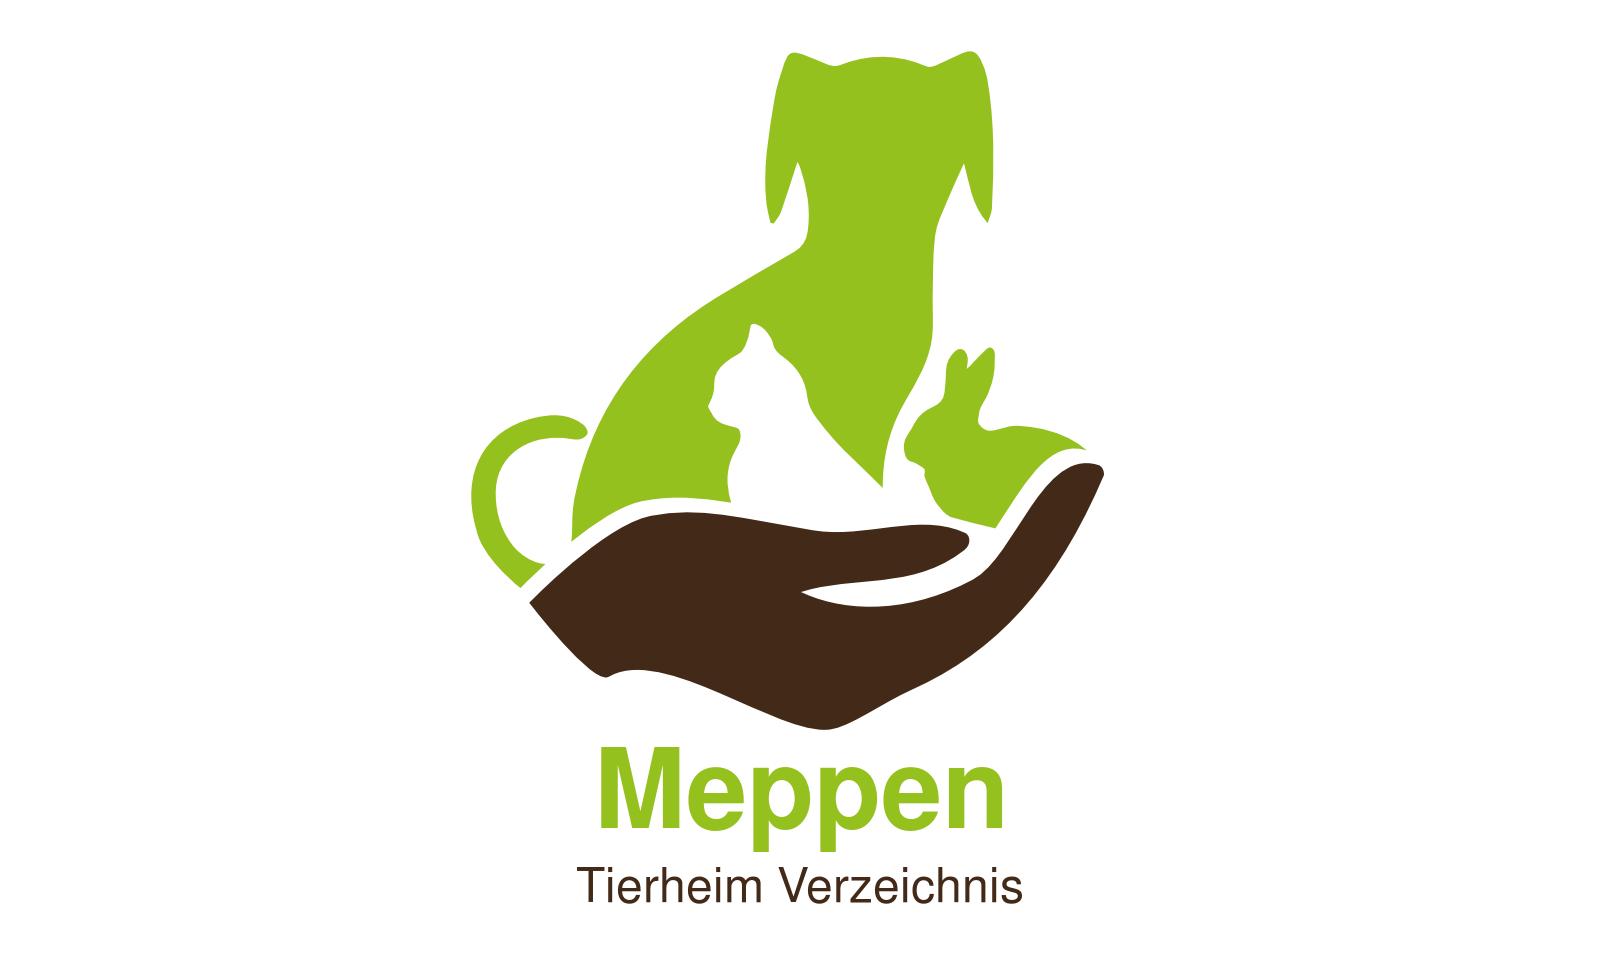 Tierheim Meppen